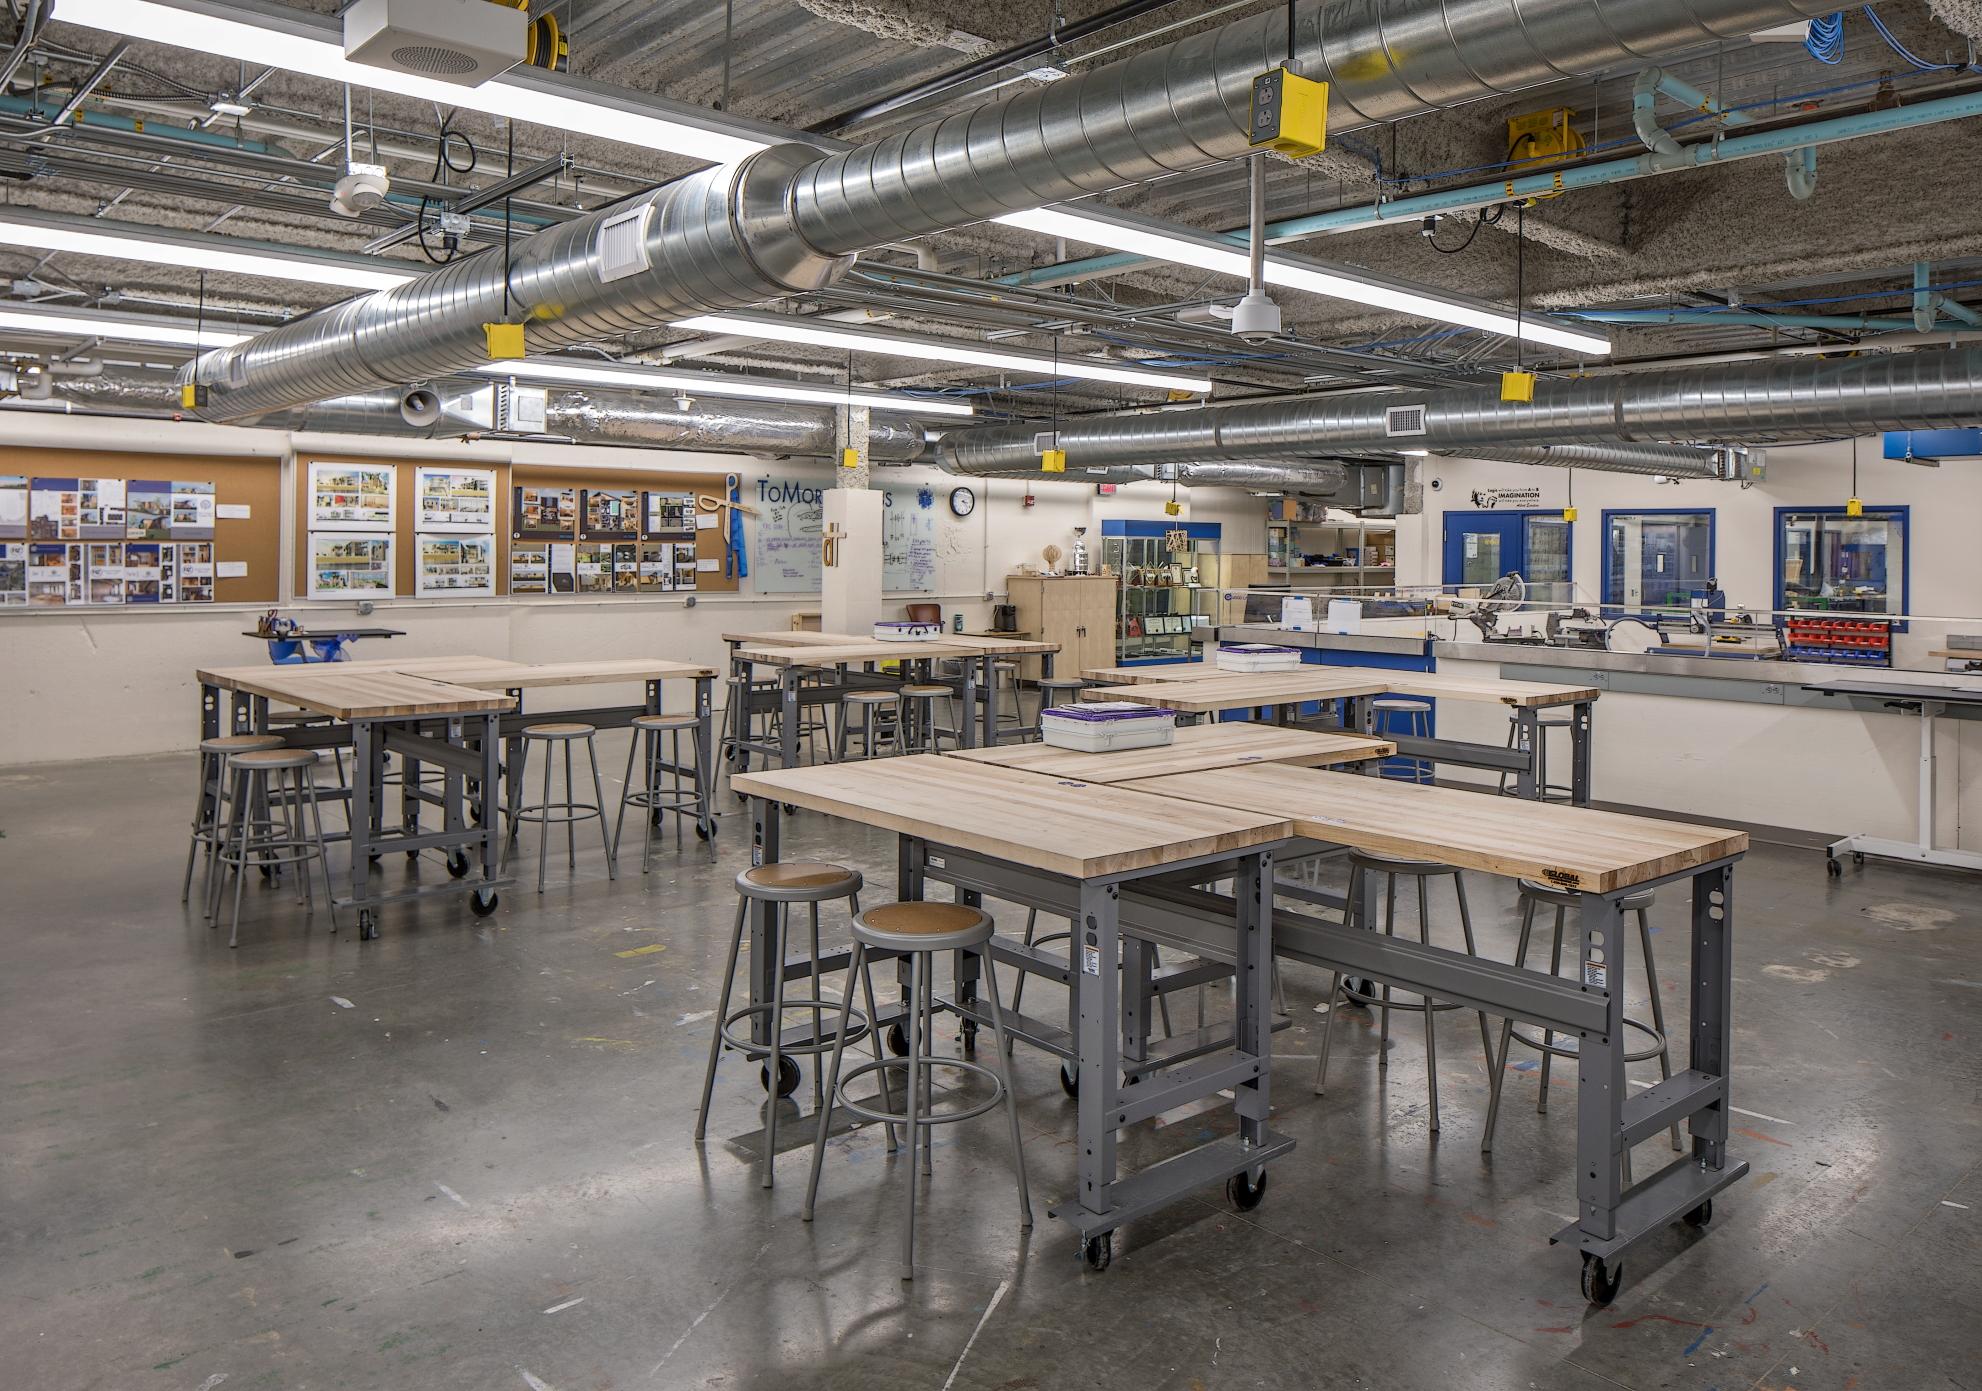 Creighton Preparatory High School STEM Laboratories